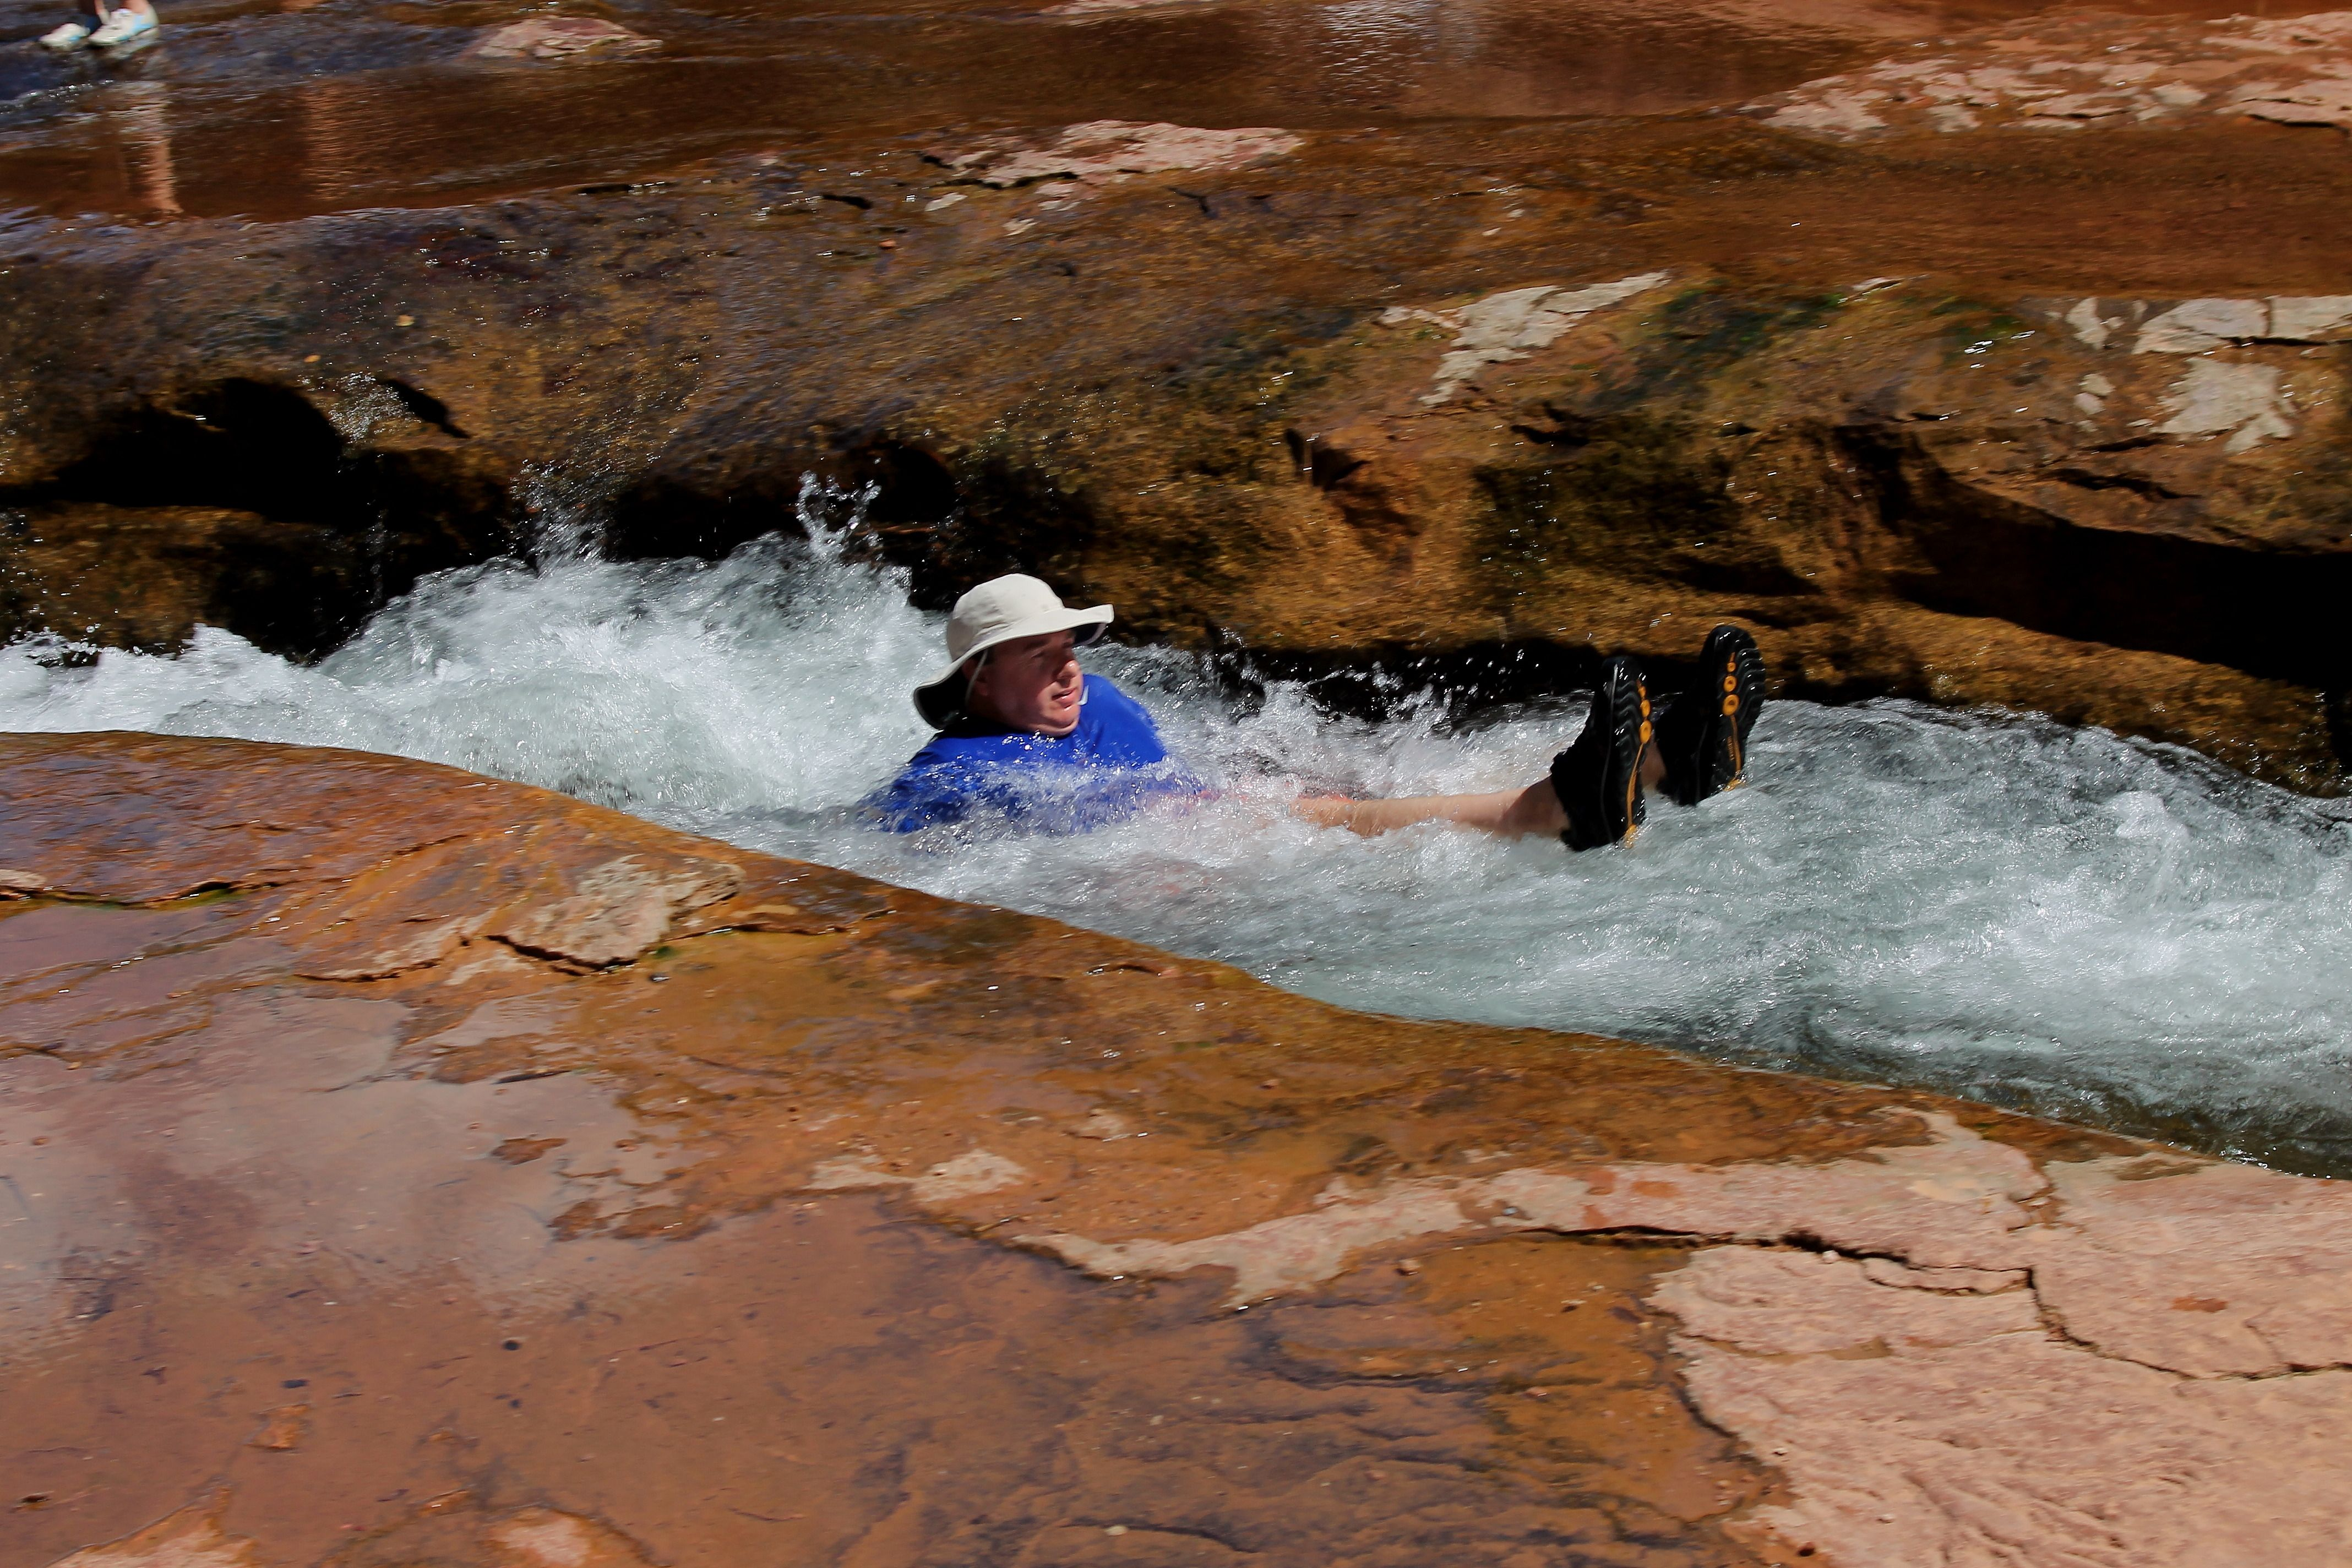 Sedona Az Slide Rock State Park Photo By Ron Redfern Swimming Spot Pinterest Park Photos